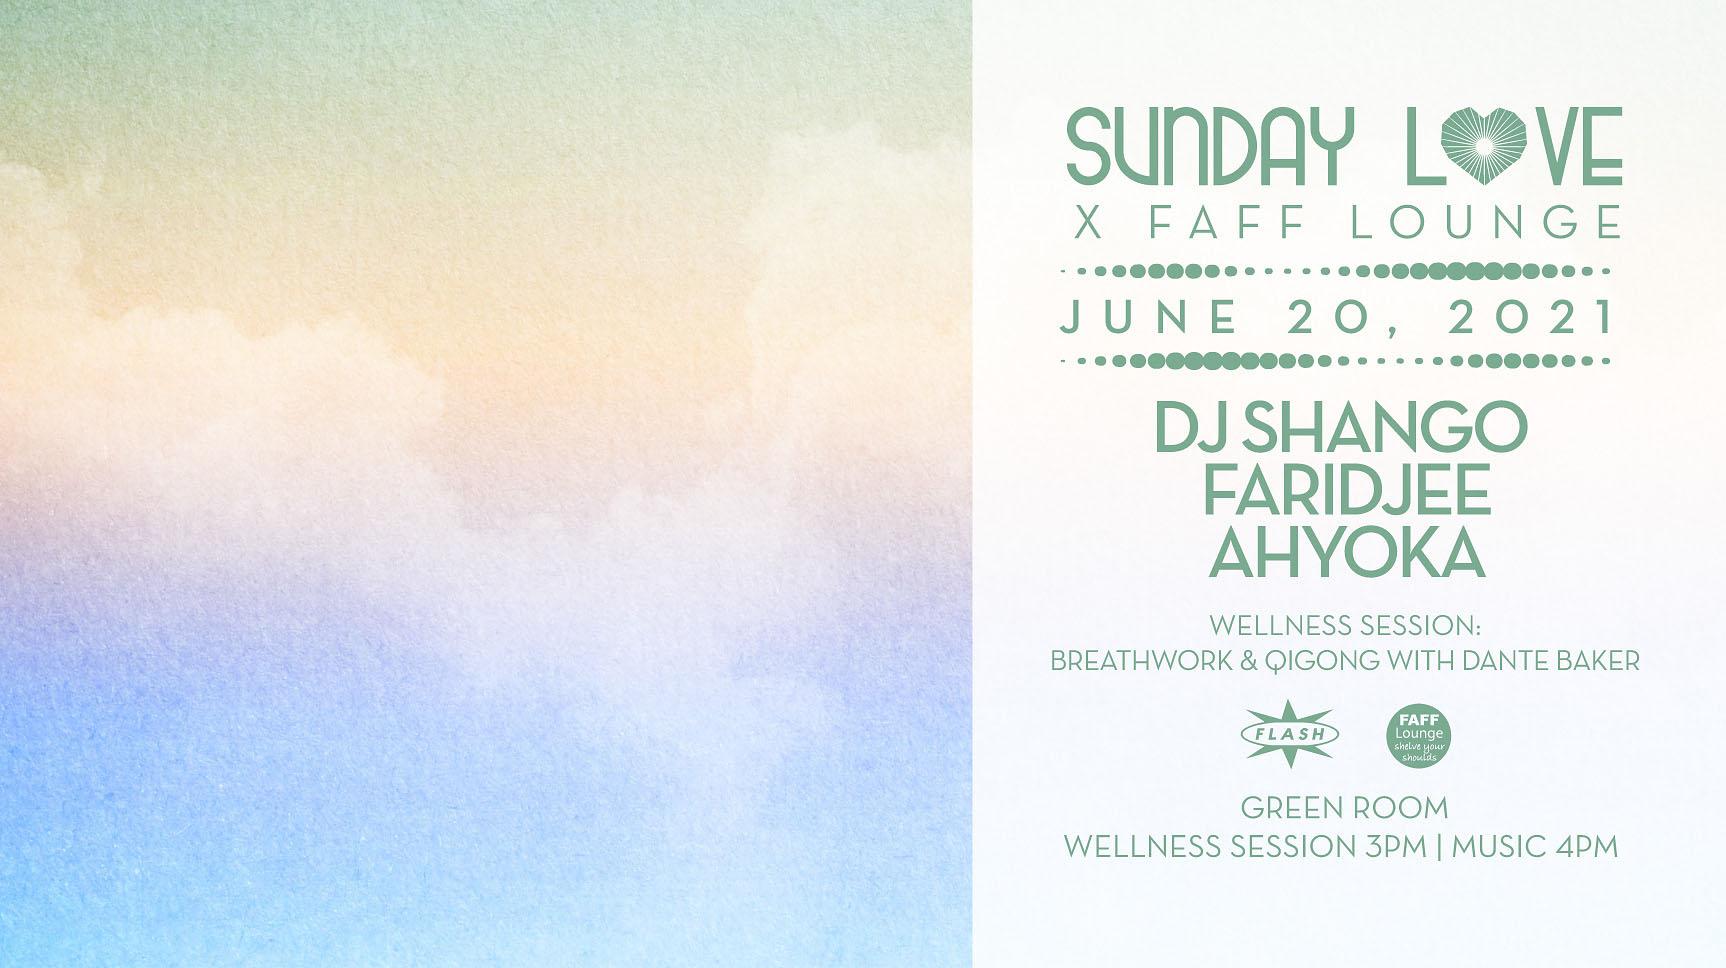 Sunday Love x FAFF Lounge - DJ Shango - Faridjee - Ahyoka